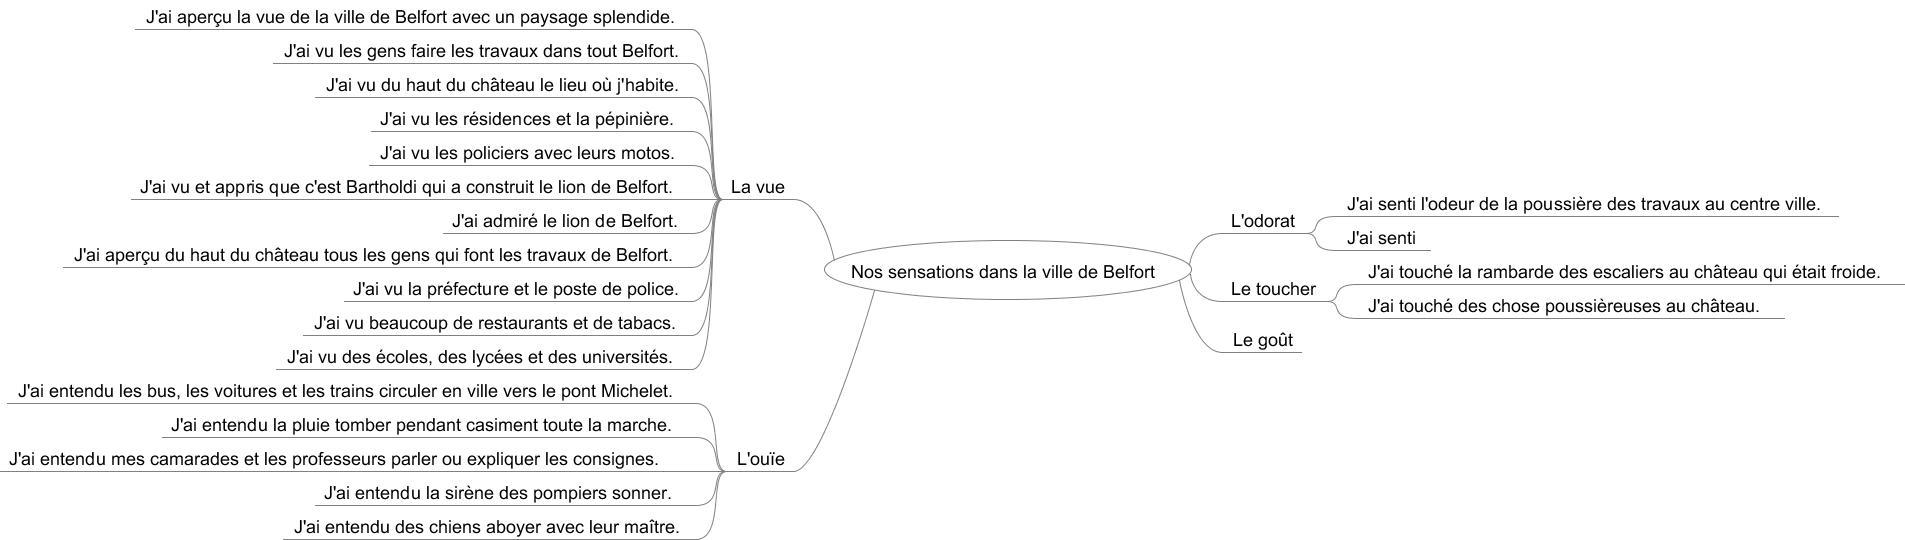 http://salle103.fr/wp-content/uploads/2013/11/Edouard-TASSIER.jpeg